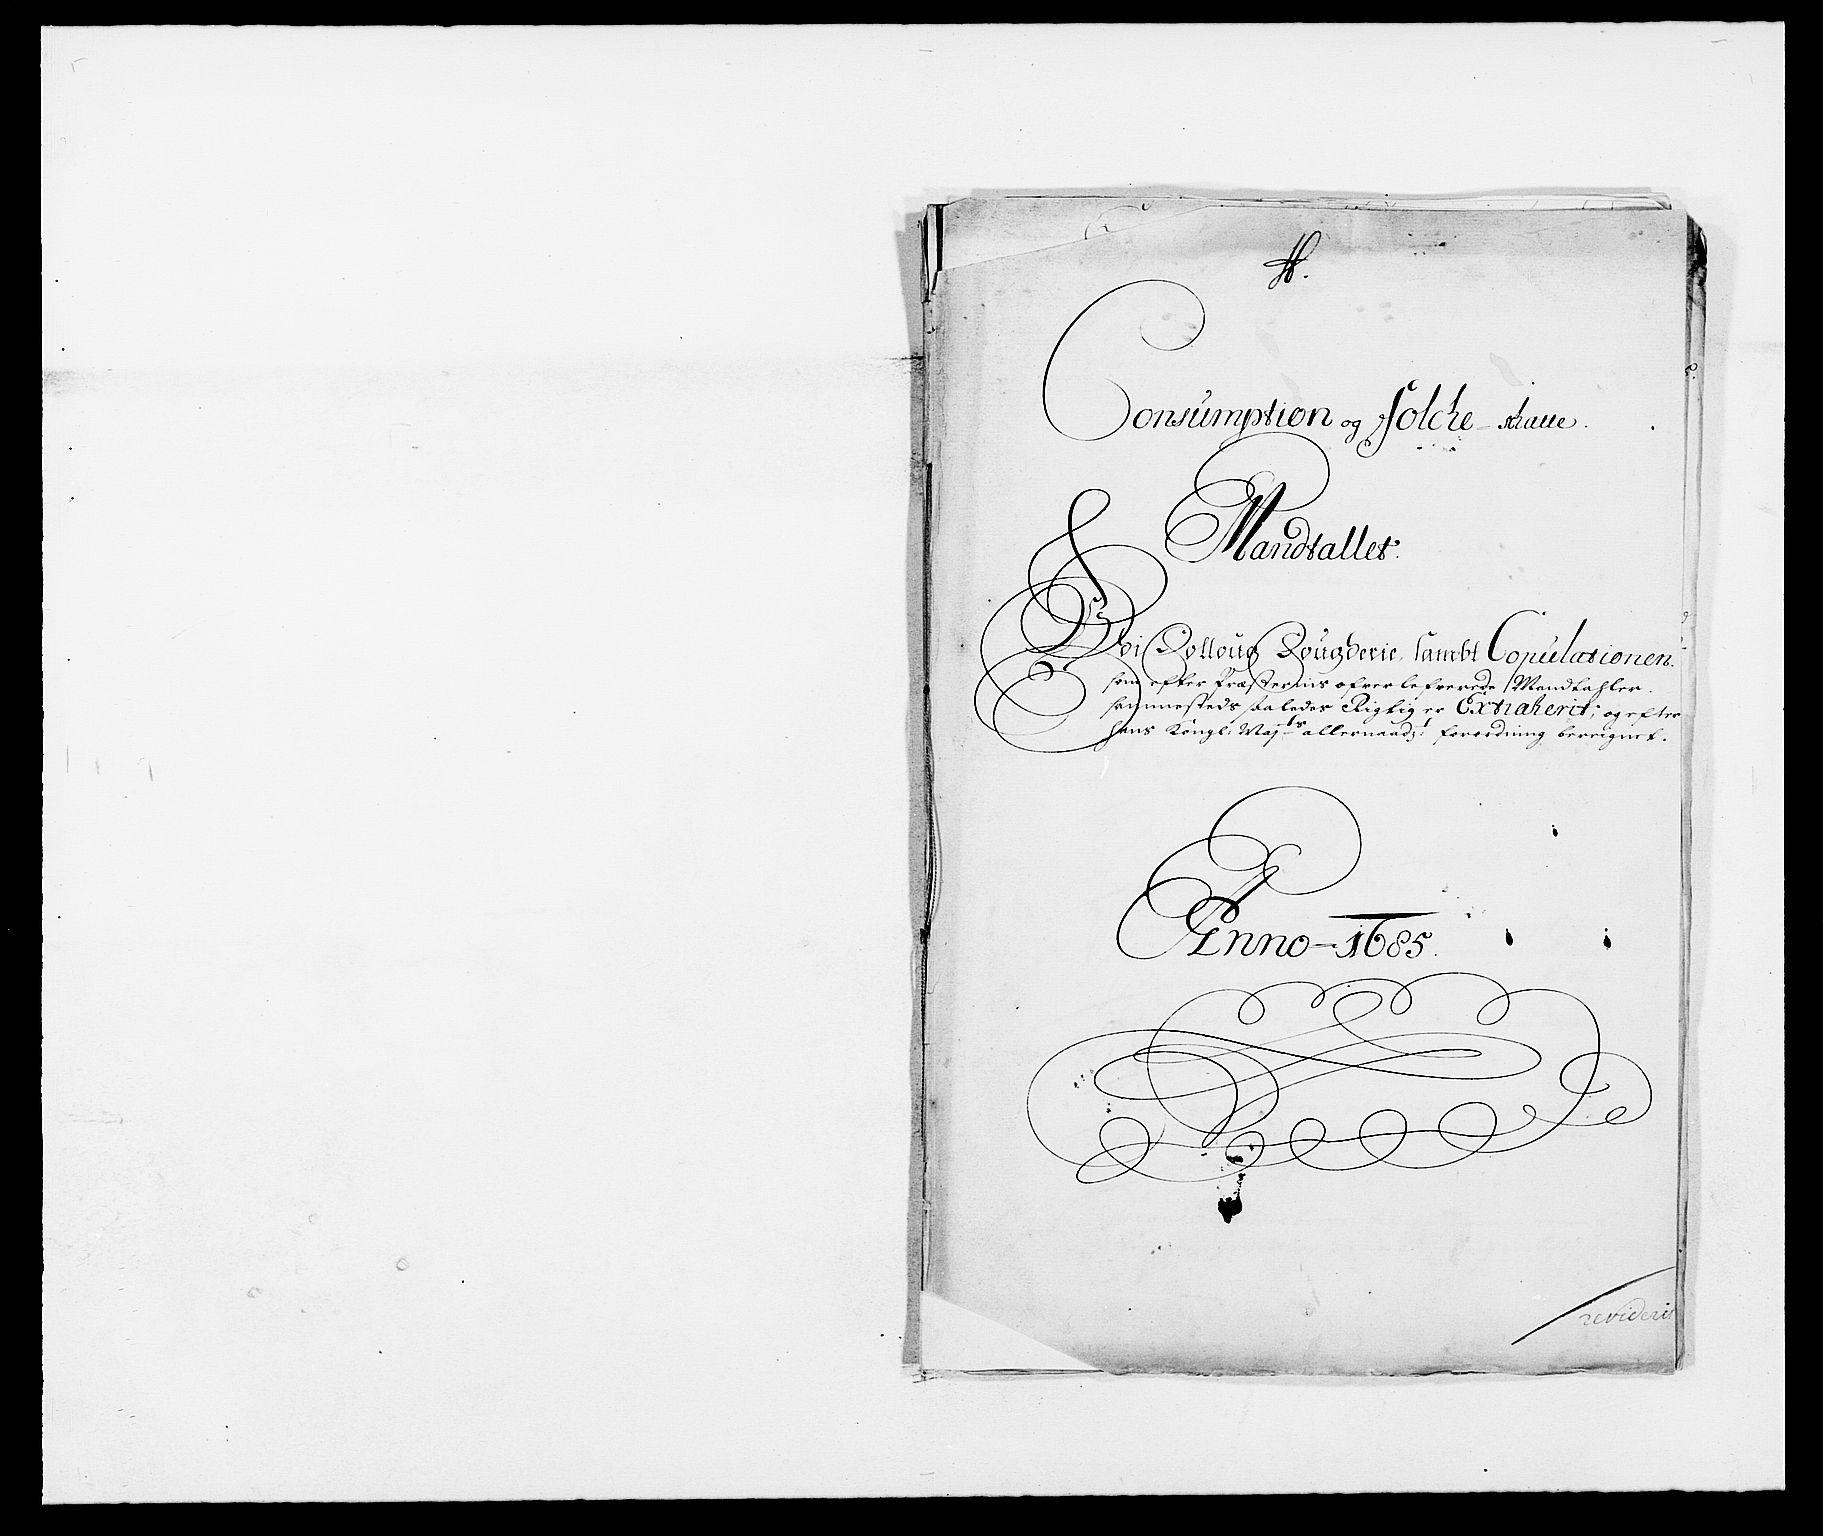 RA, Rentekammeret inntil 1814, Reviderte regnskaper, Fogderegnskap, R09/L0433: Fogderegnskap Follo, 1685-1686, s. 188